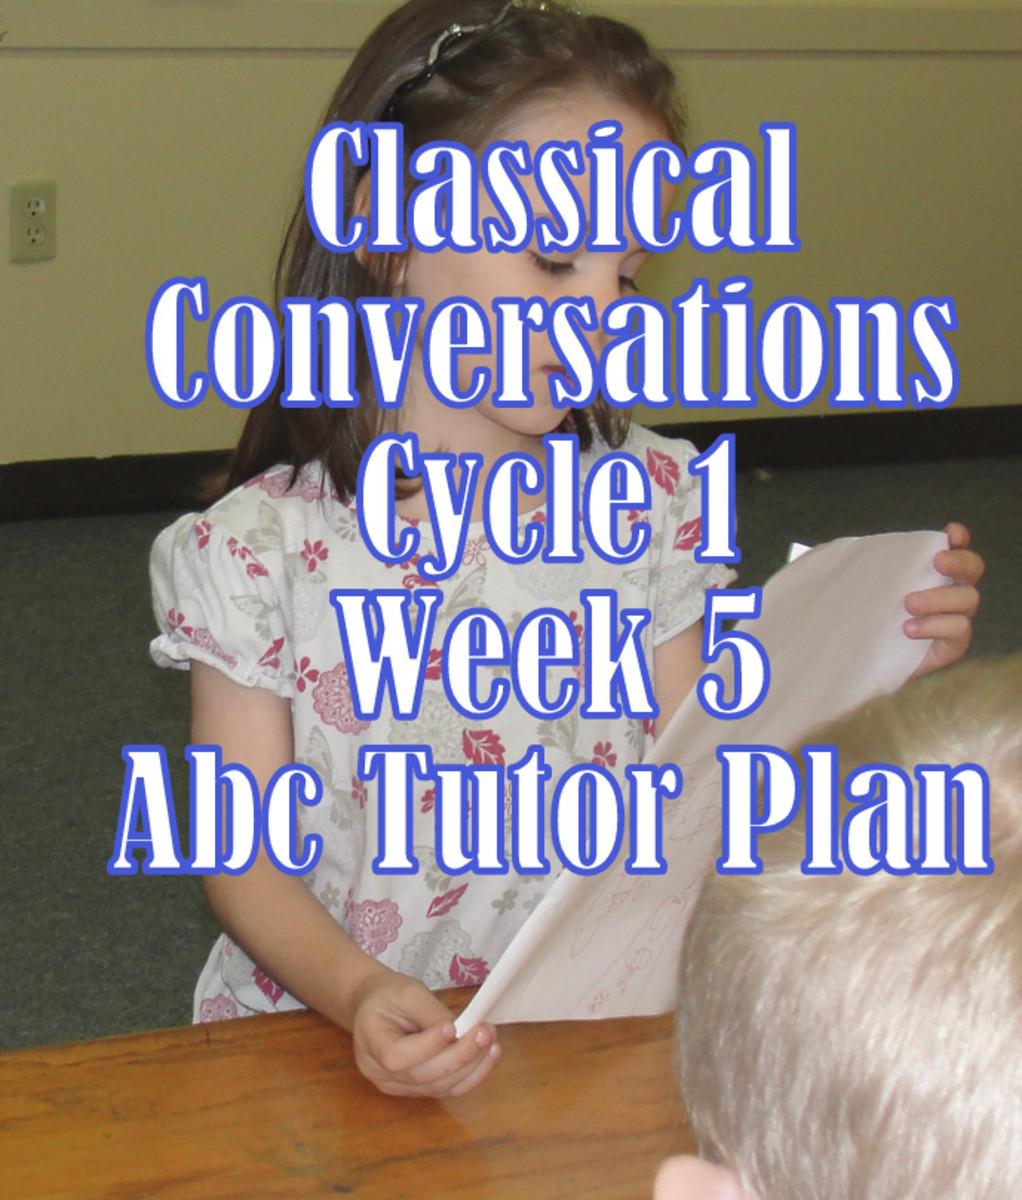 CC Cycle 1 Week 5 Plan for Abecedarian Tutors